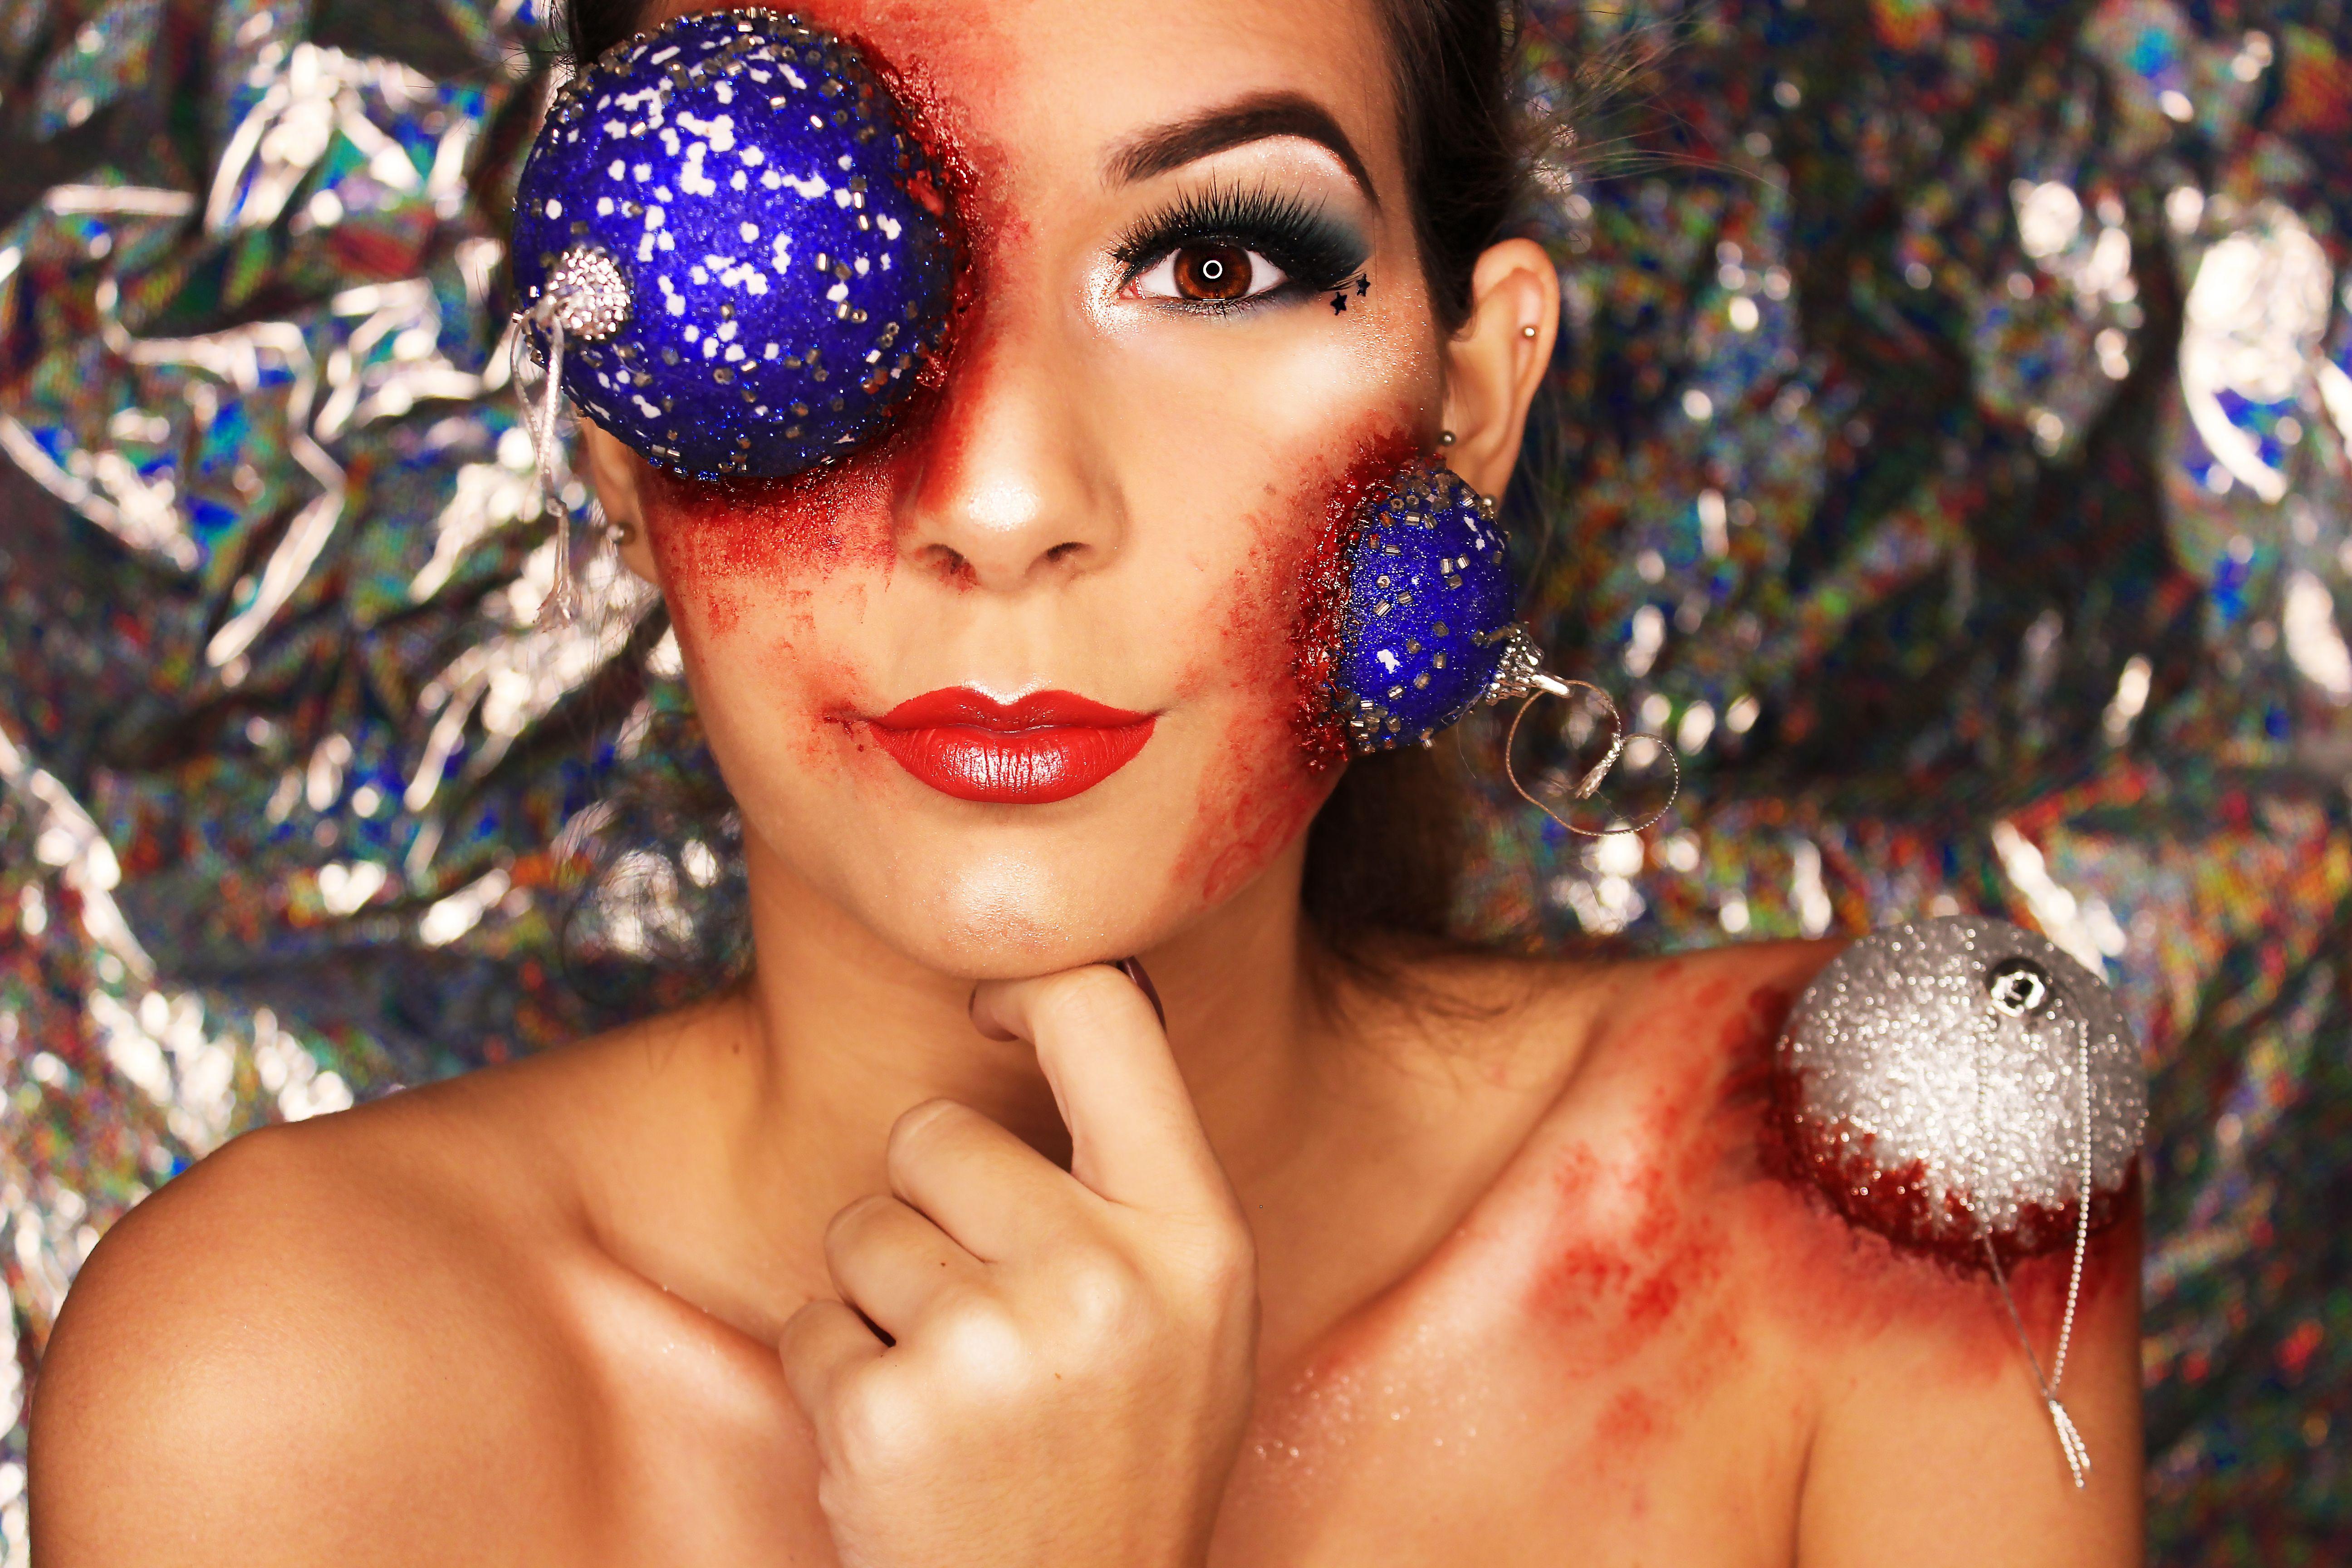 makeup sfx christmassfx Makeup, Photo and video